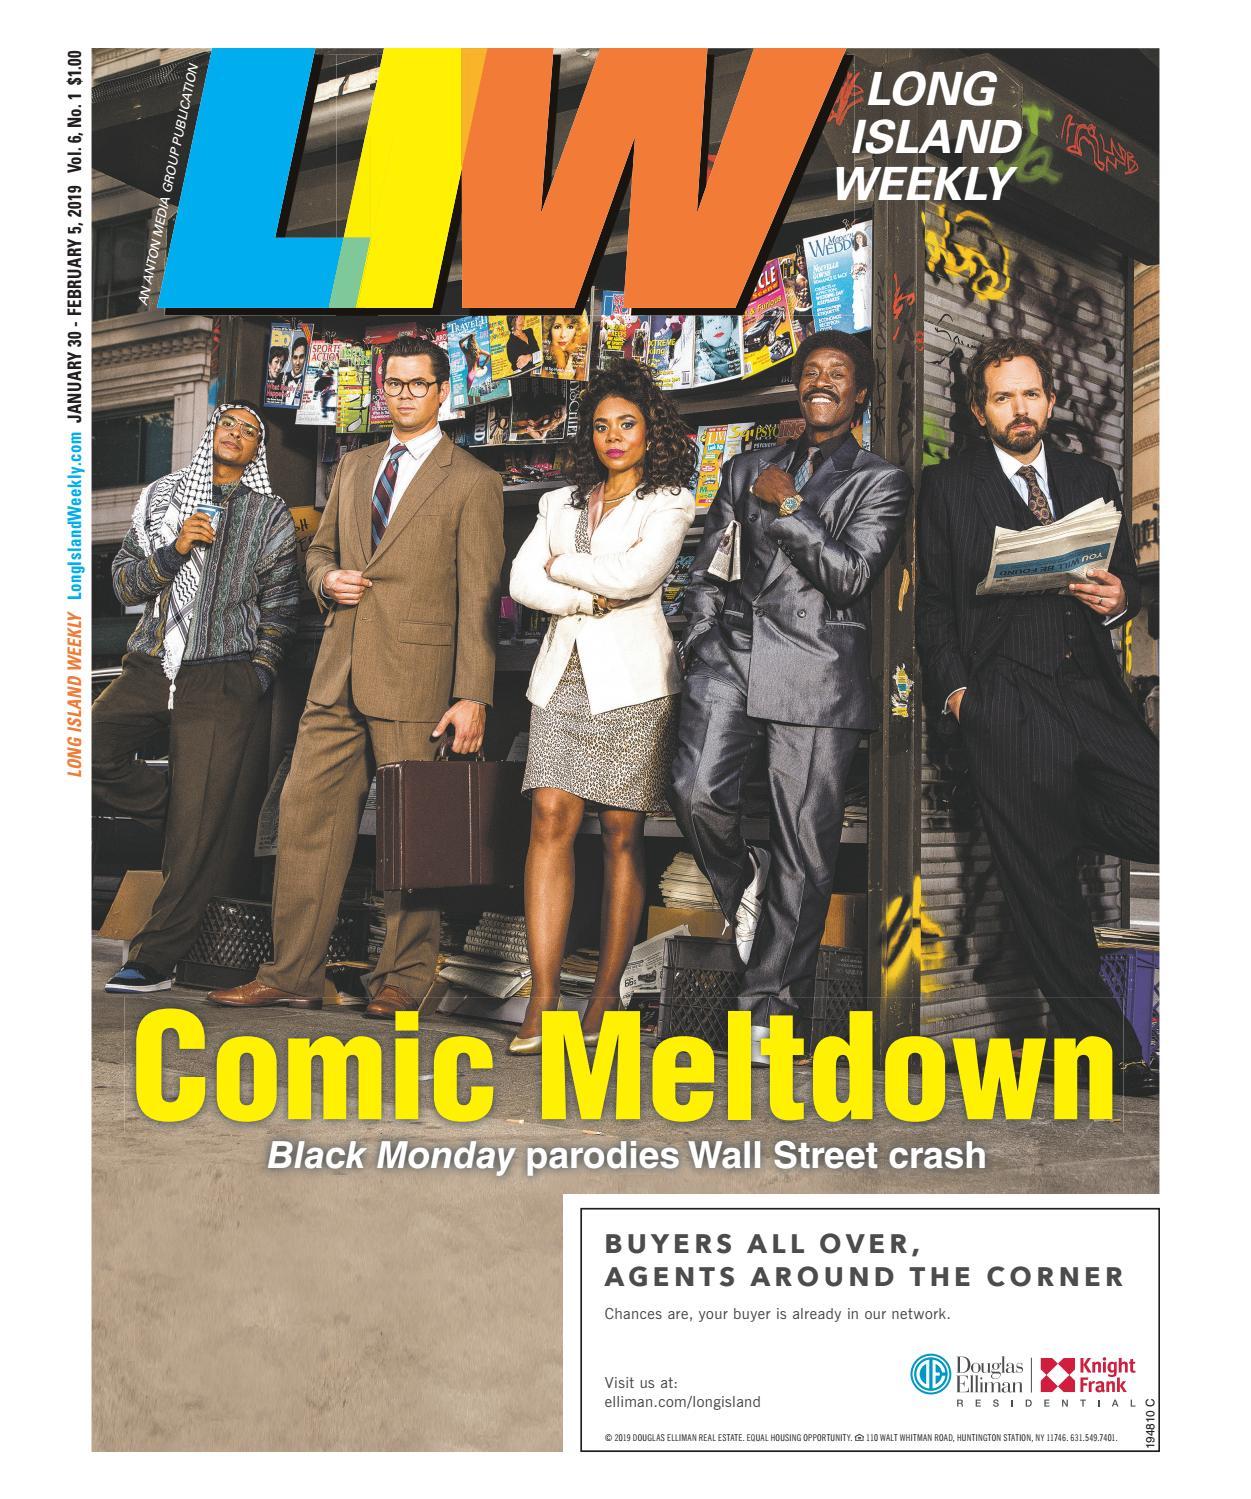 c57a42737 Long Island Weekly 01-30-19 by Anton Community Newspapers - issuu